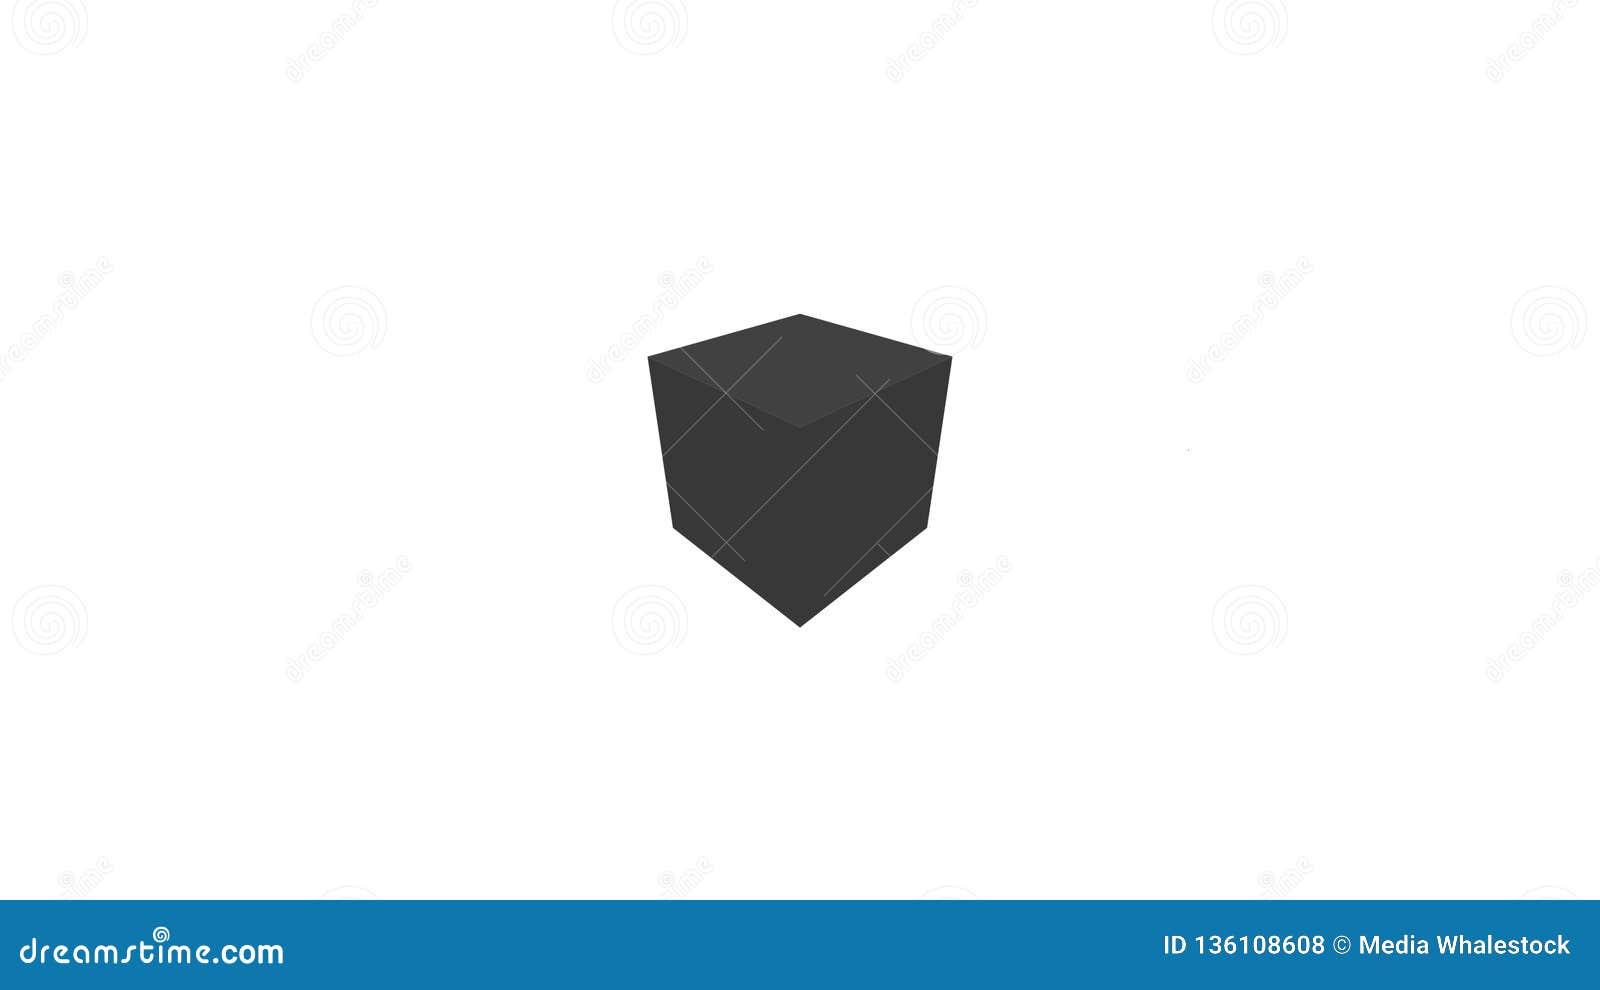 Animation of network marketing scheme. Online Marketing Concept. Networking, social media, SNS, internet communication